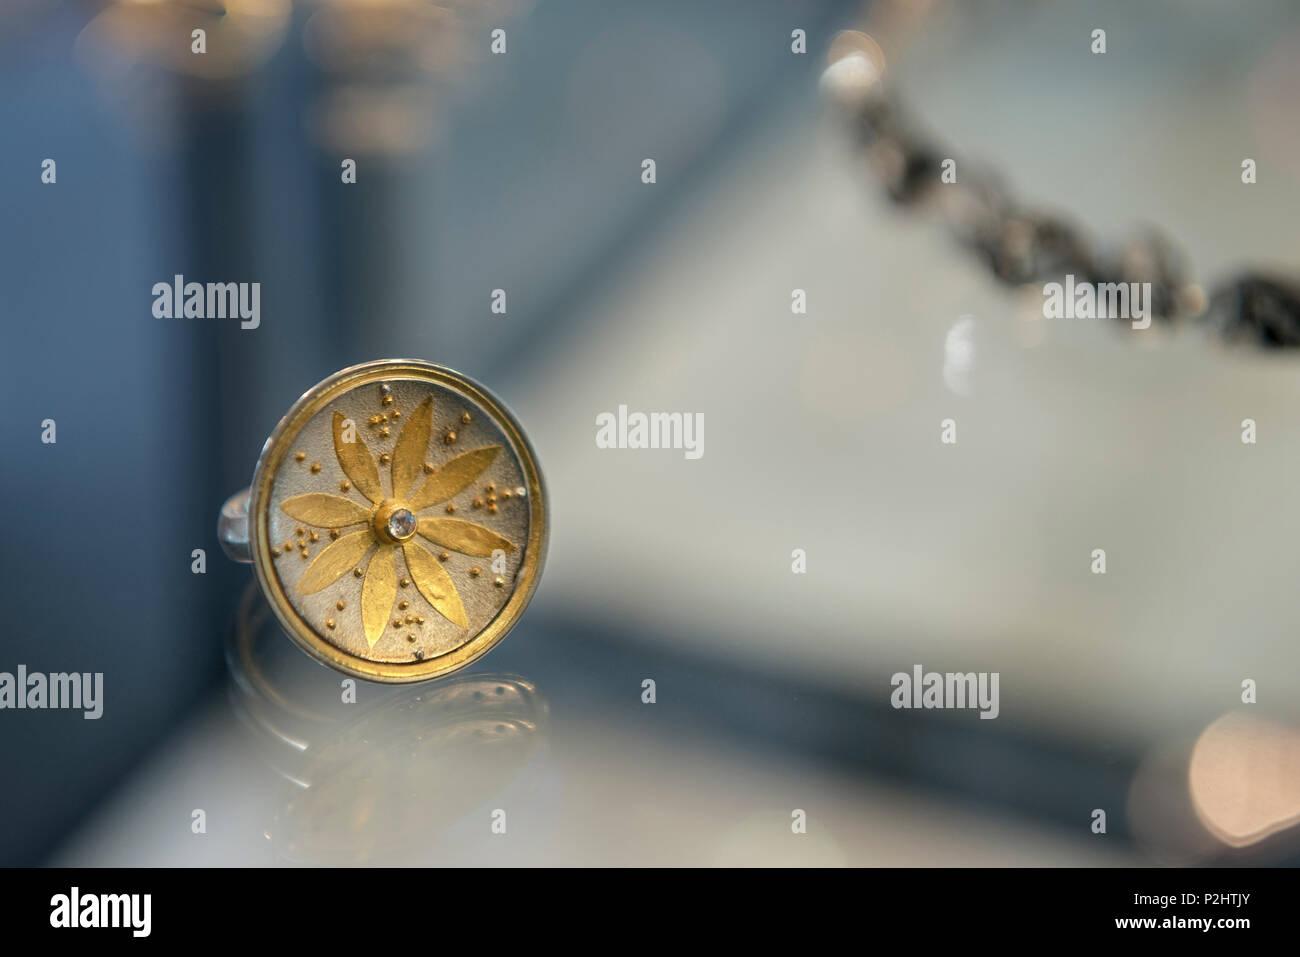 Goldsmith turning gold into jewellery, handcraft, Ueberlingen, Lake Constance, Baden-Wuerttemberg, Germany - Stock Image